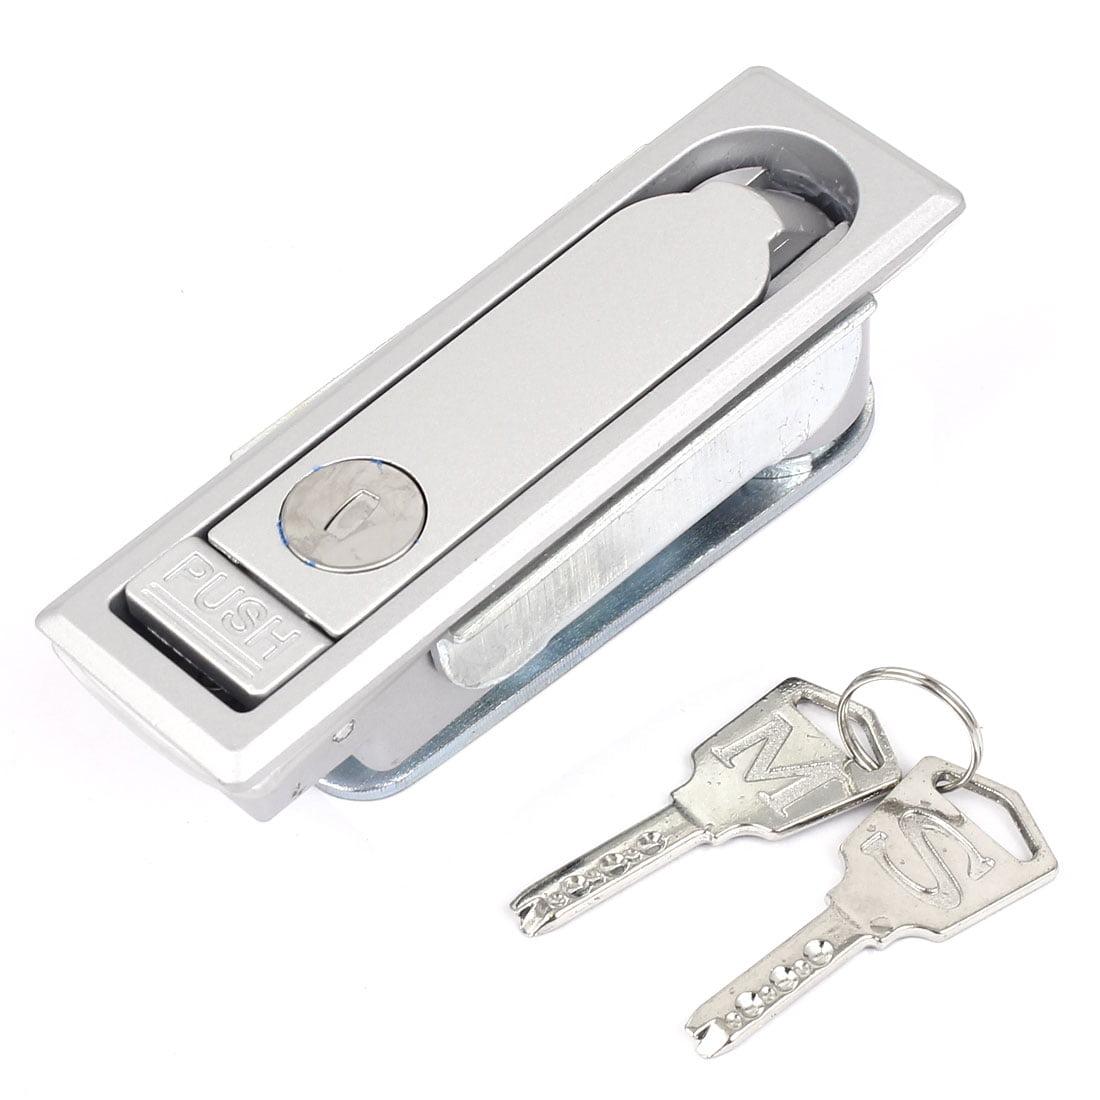 Unique Bargains 11cm Long Rectangle Shaped Panel Lock for Machine File Cabinet Door